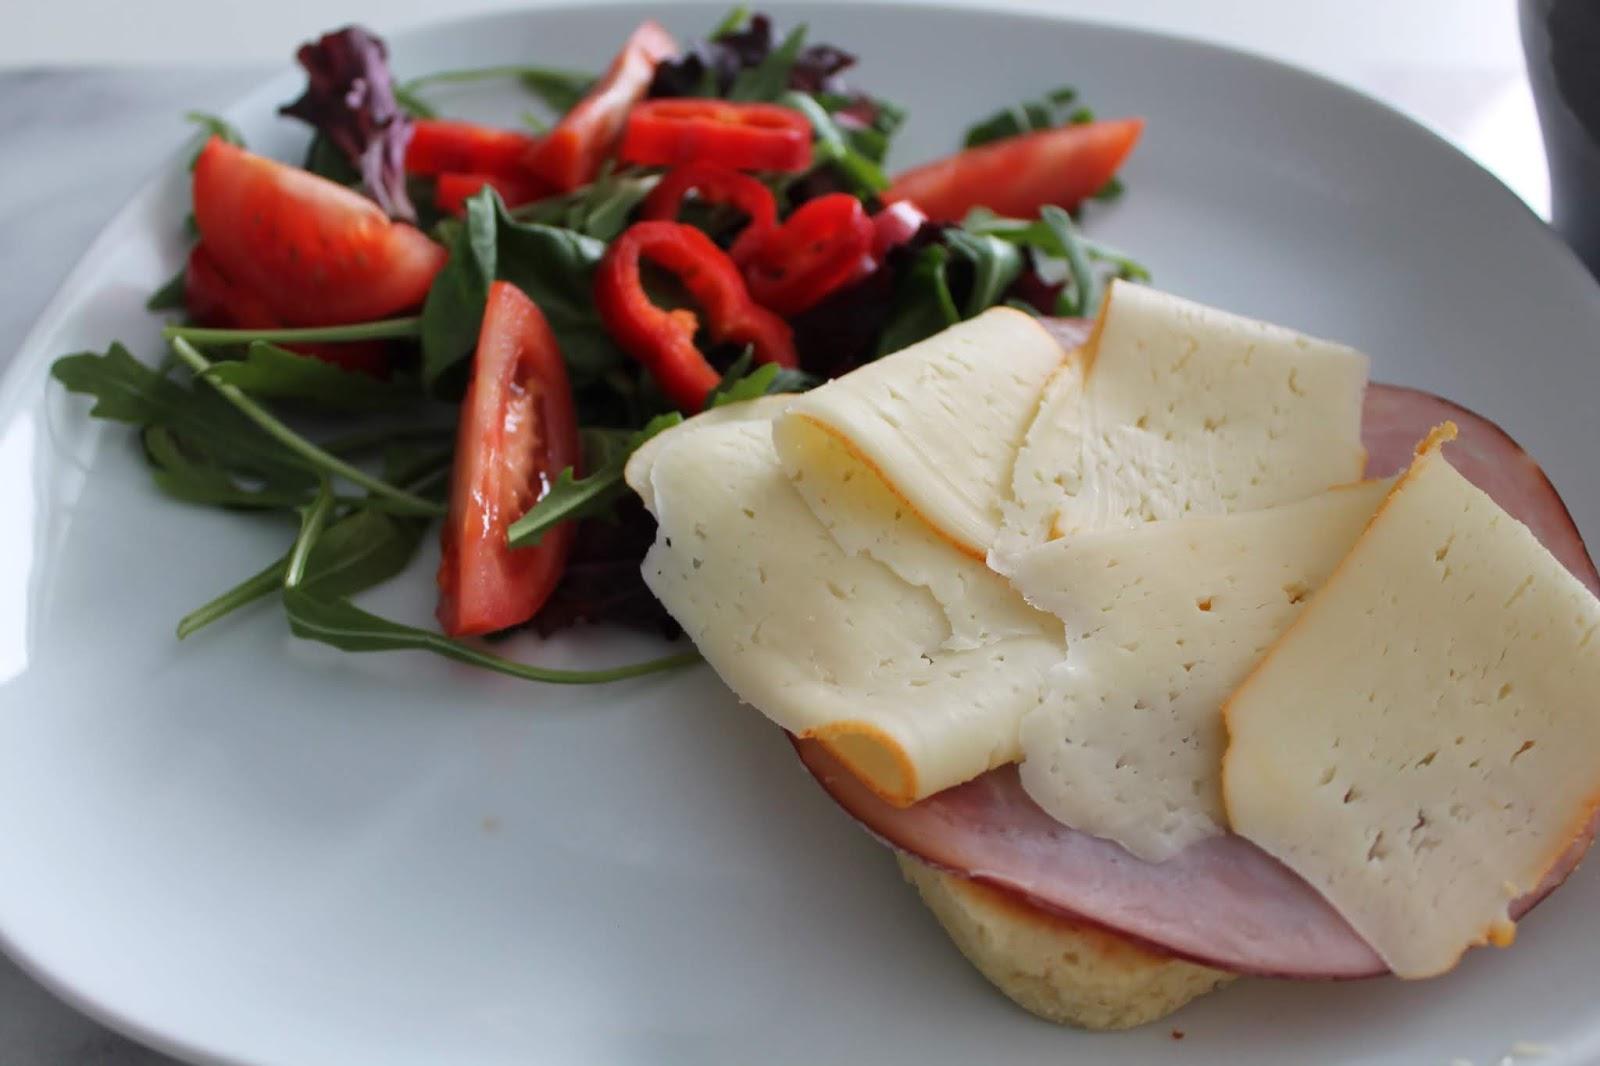 Lunchmacka med ost o skinka Lchf